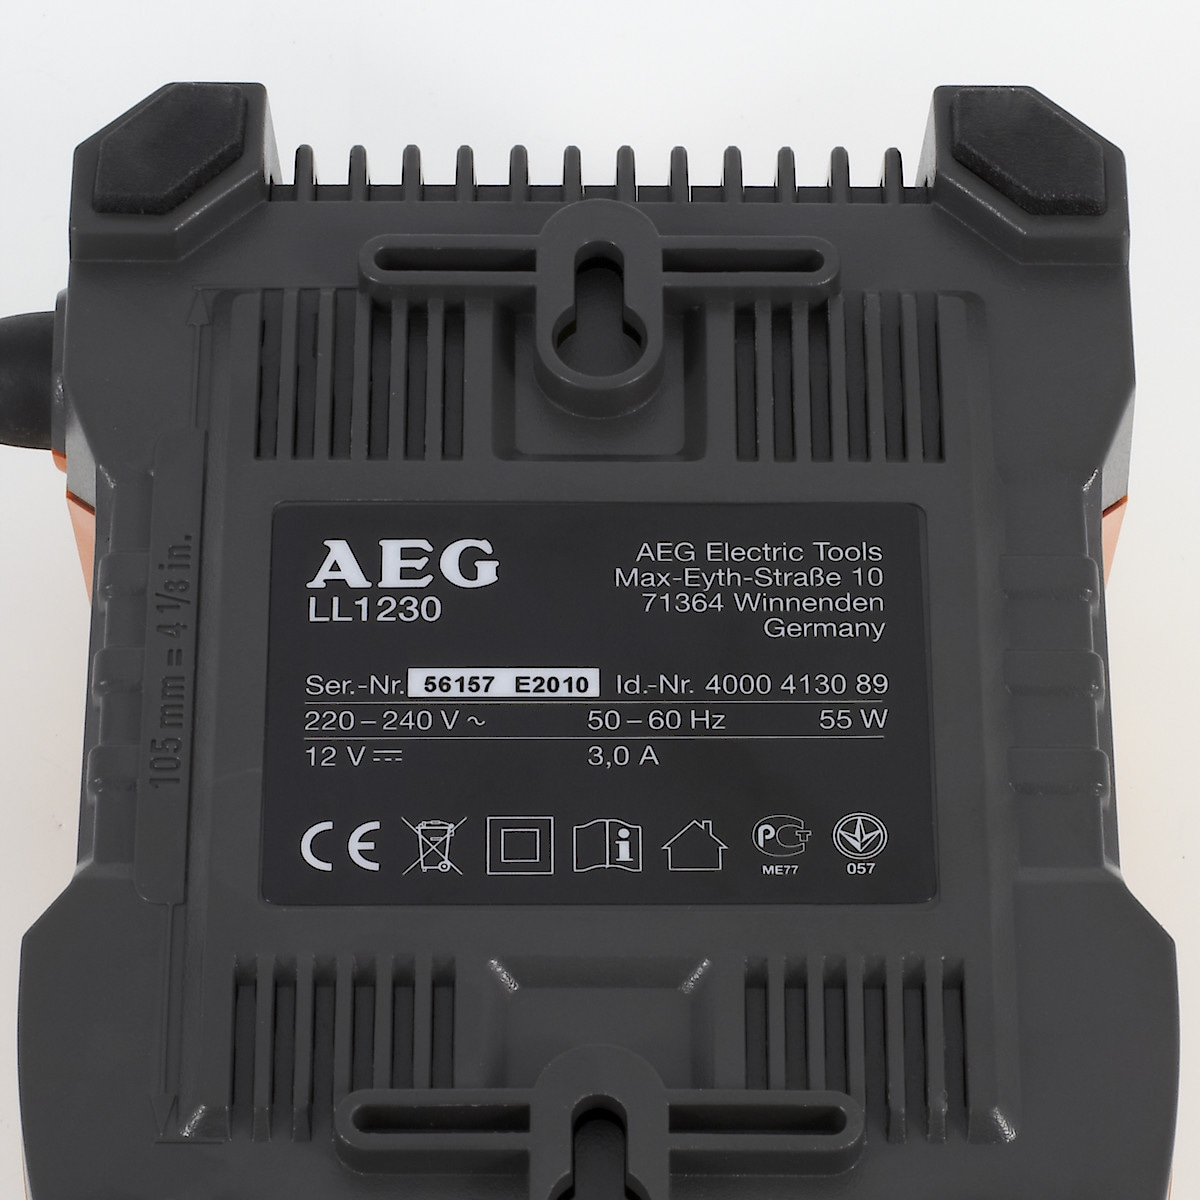 Laddare AEG LL1230 12 V/3 A